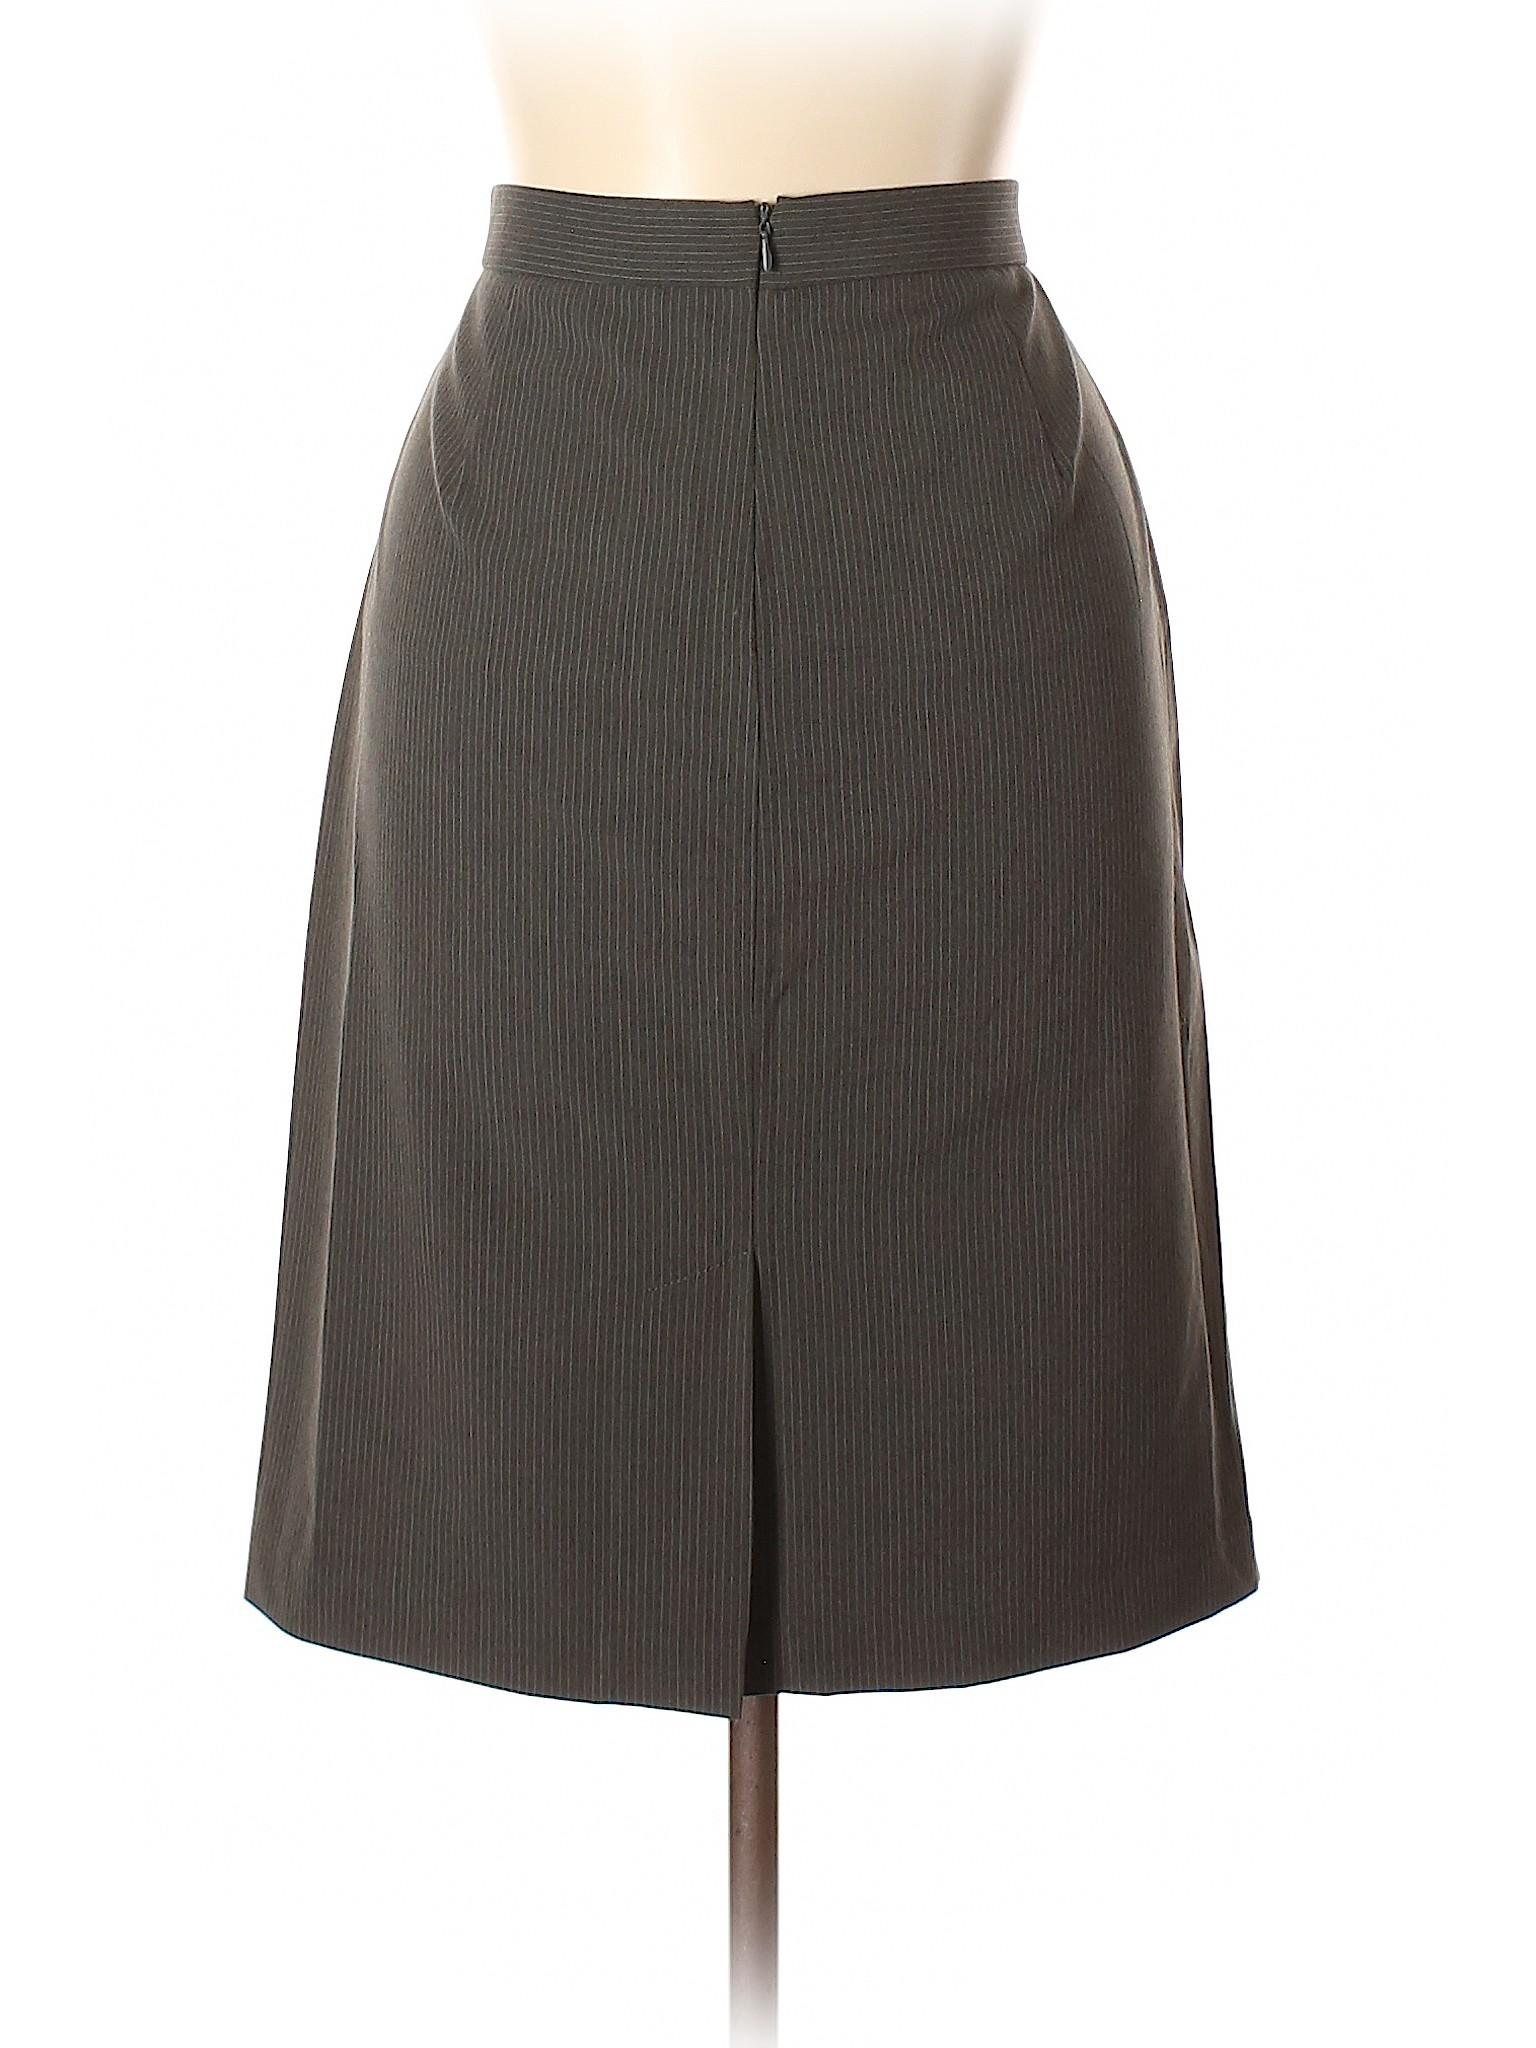 Casual Boutique Boutique Casual Boutique Boutique Skirt Skirt Casual Skirt Casual wPCq8